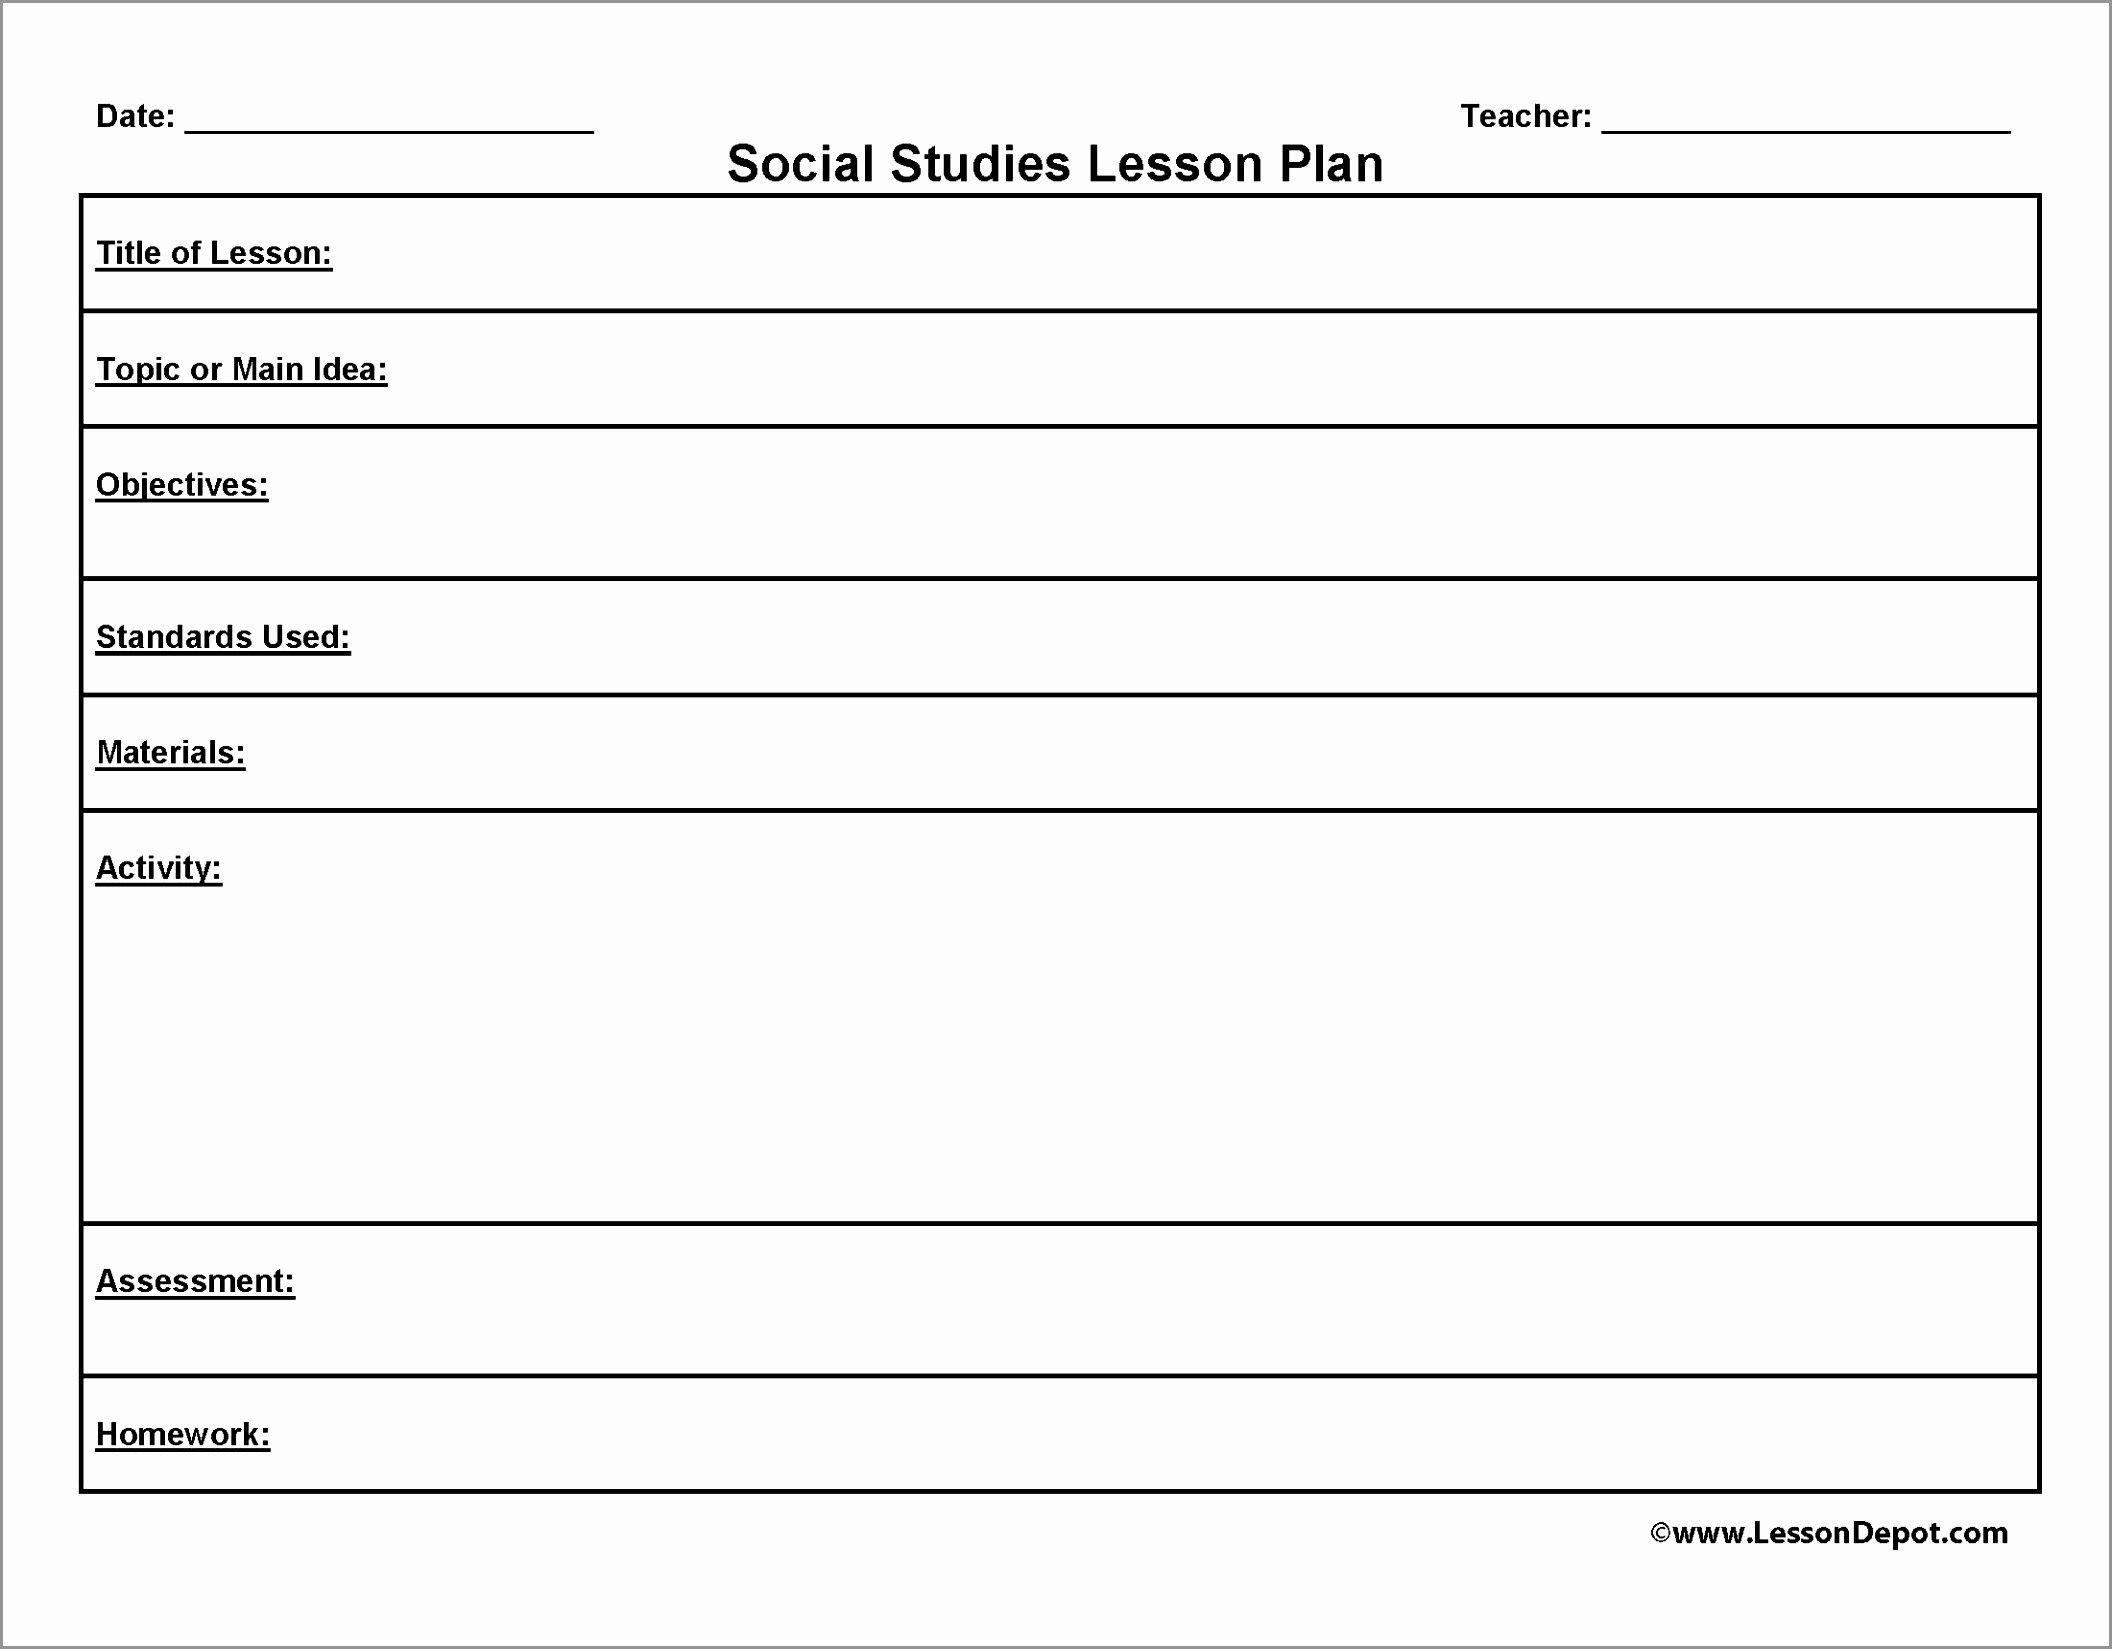 Lesson Plan Template Doc Inspirational 9 asca Lesson Plan Template Pwapi